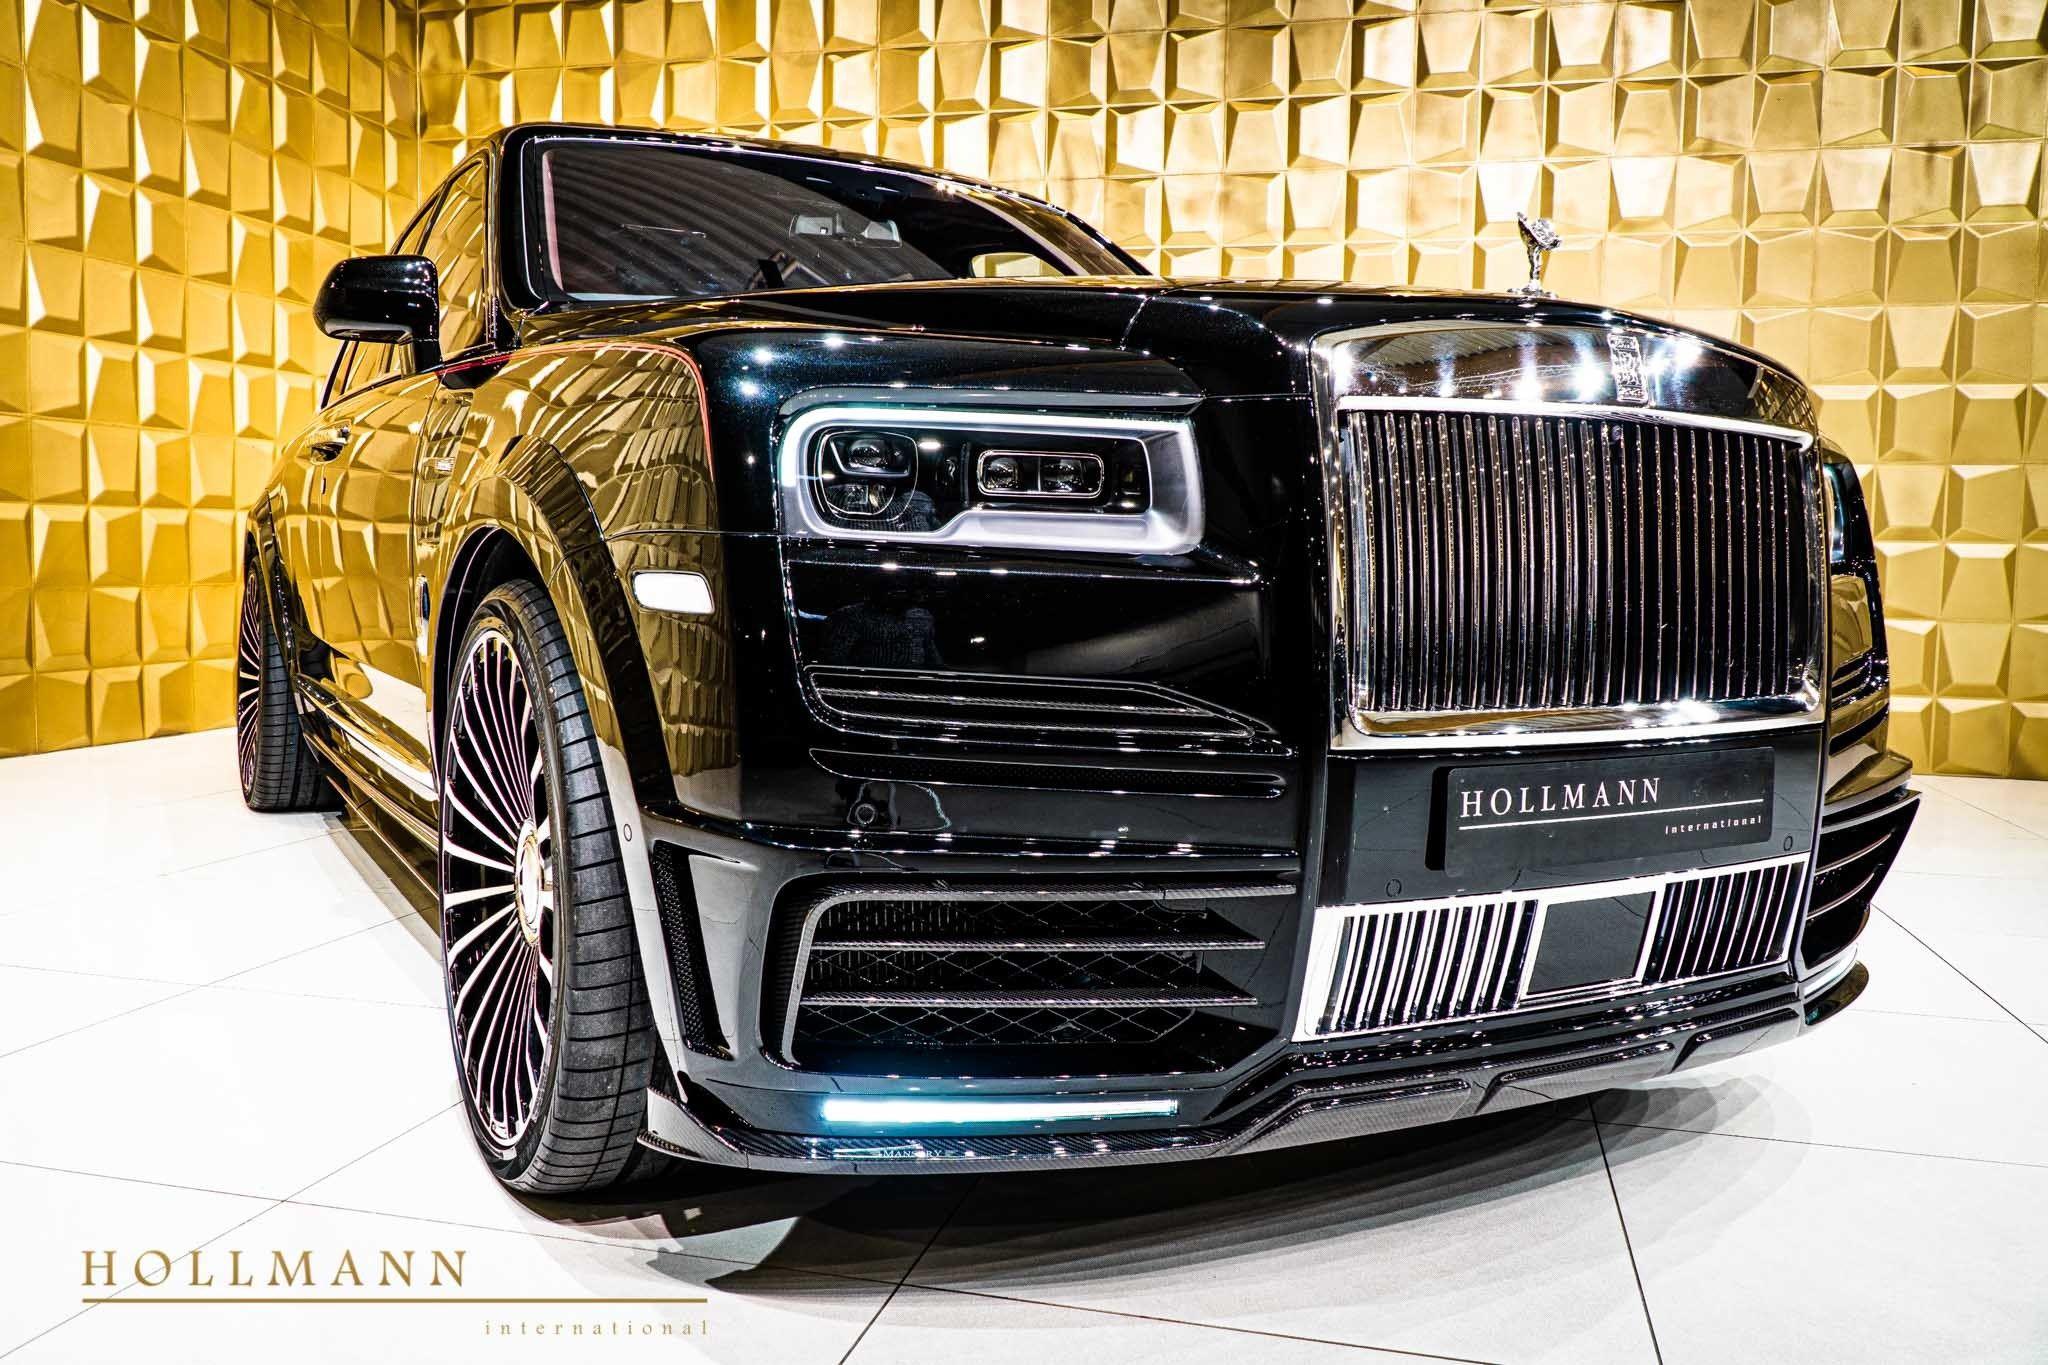 For Sale Rolls Royce Cullinan By Mansory Hollmann International Germany For Sale On Luxurypulse Rolls Royce Rolls Royce Cullinan Small Luxury Cars